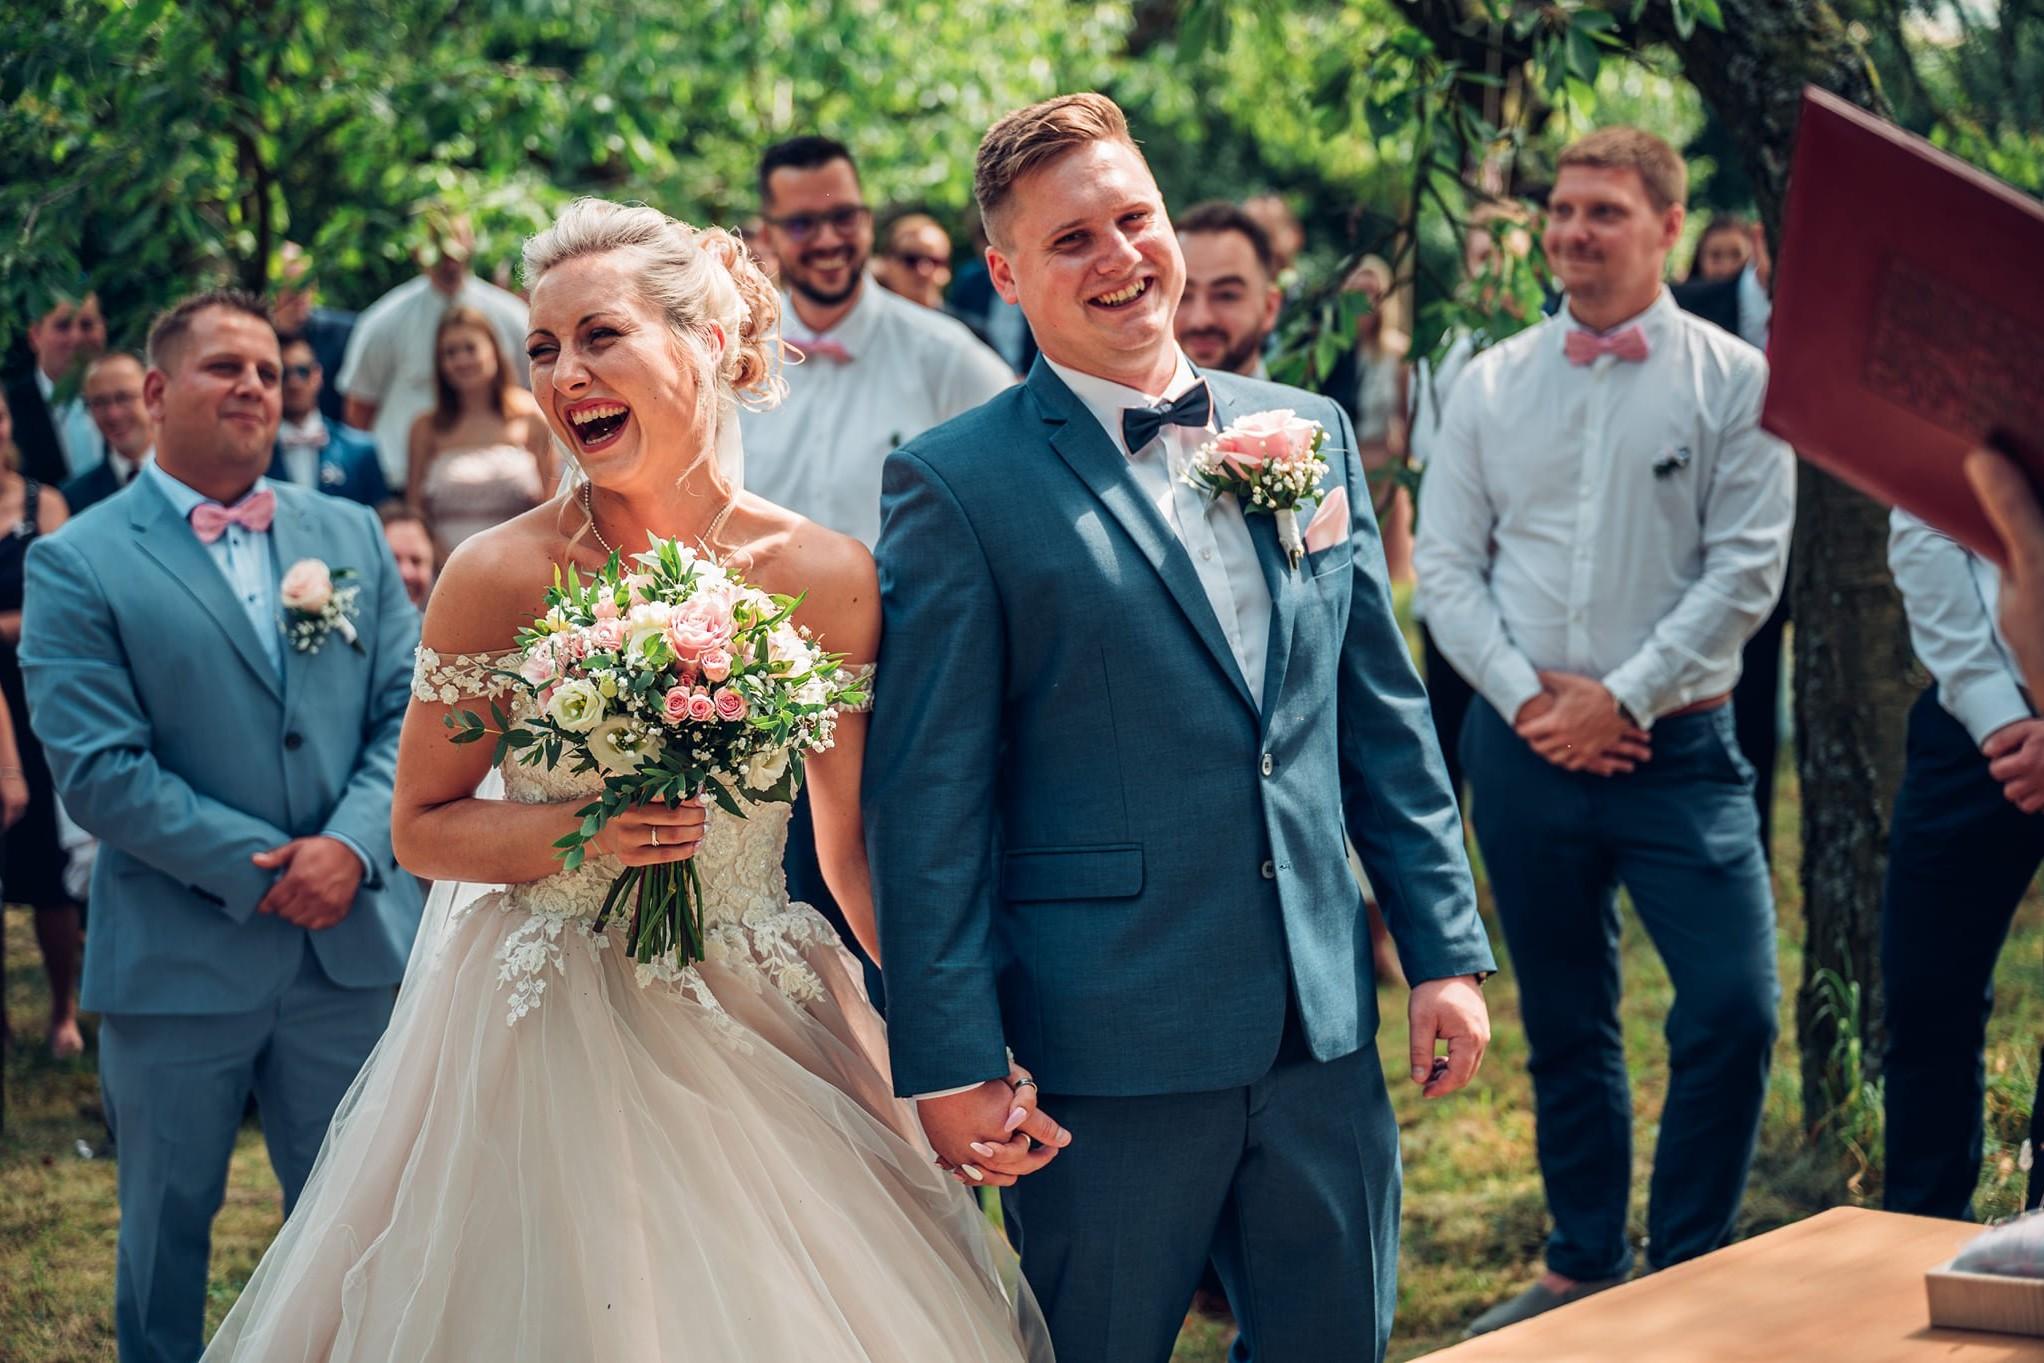 svatba v jičíně, svatba jičín, svatební fotograf jičín